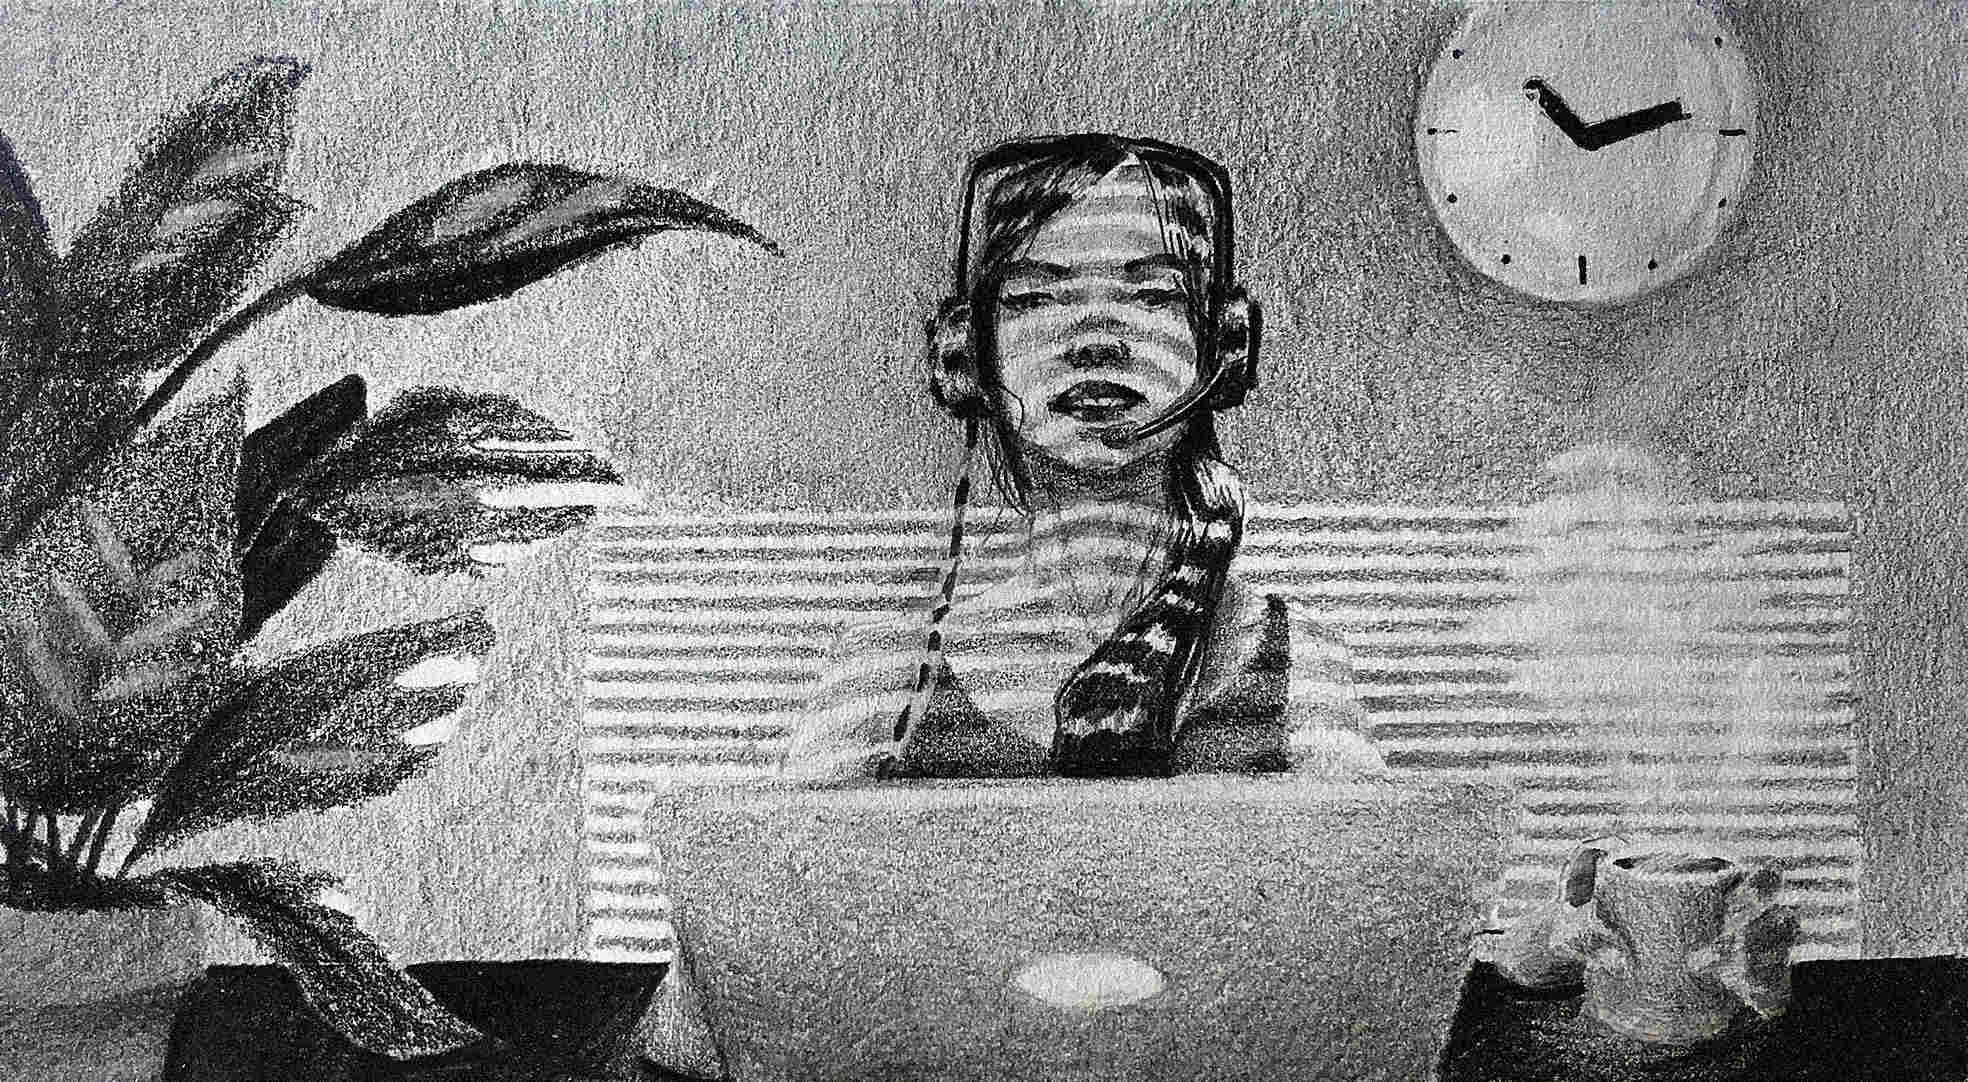 Illustration: Virtual Customer Service Agent